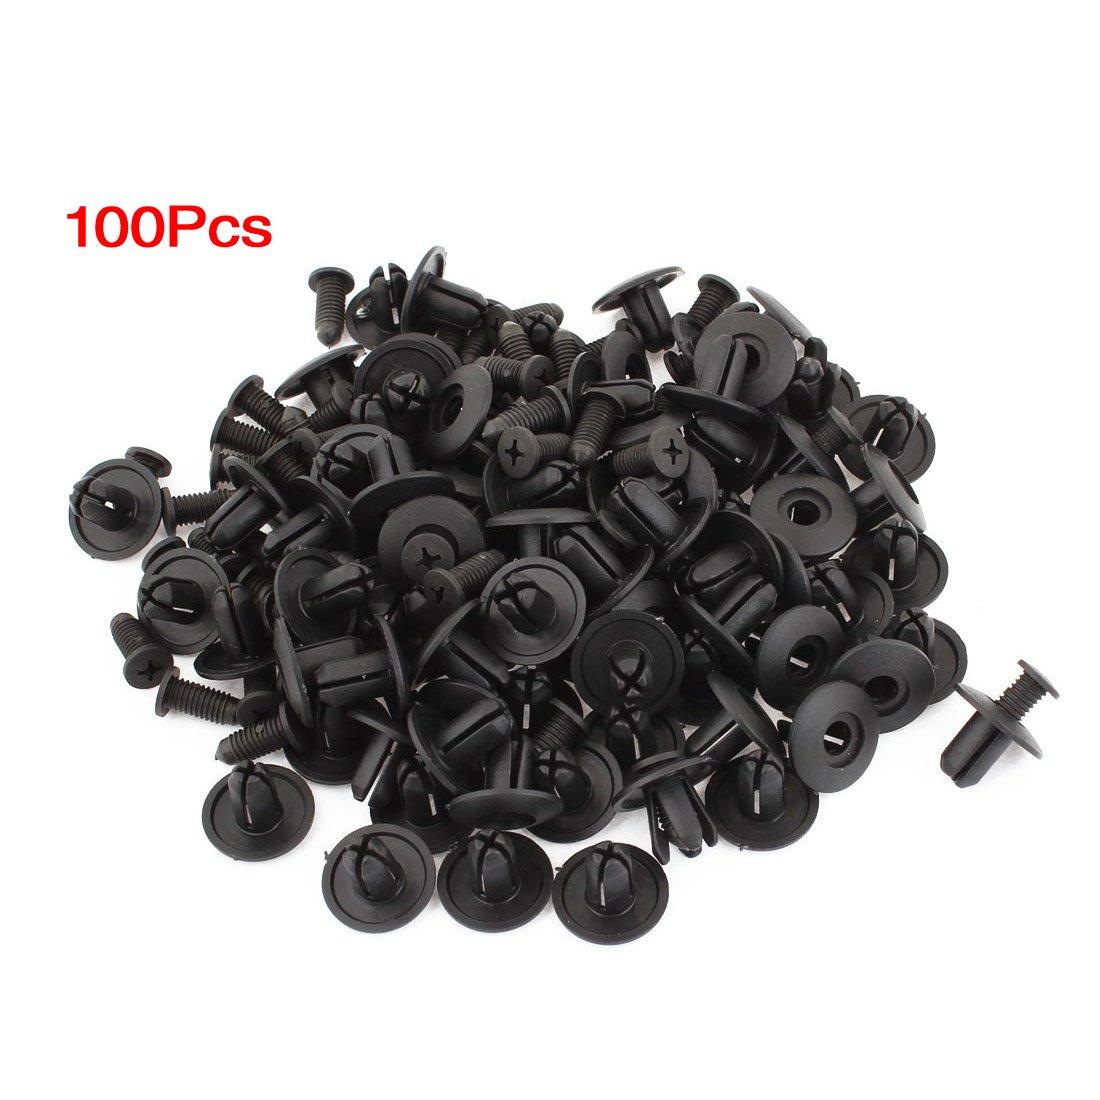 Cikuso R 8 millimetri Diametro Foro plastica Rivetti Fastener Parabordo Paraurti Push Pin Clips x100